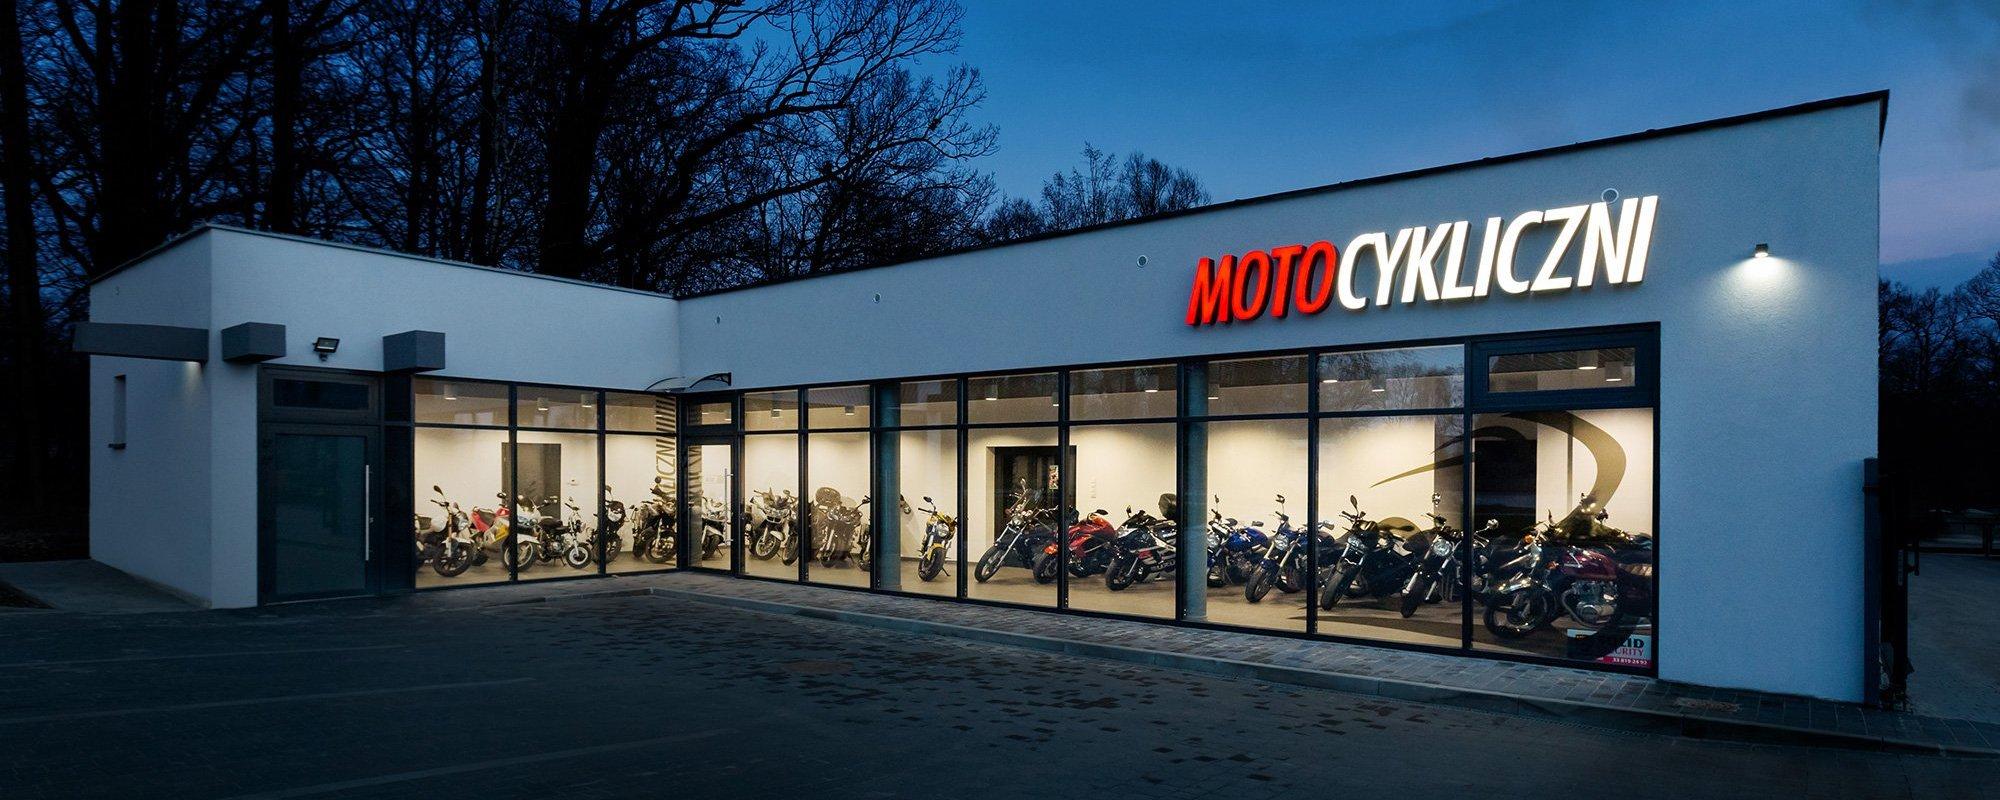 2016-03::1458909697-motocykliczni-top.jpg